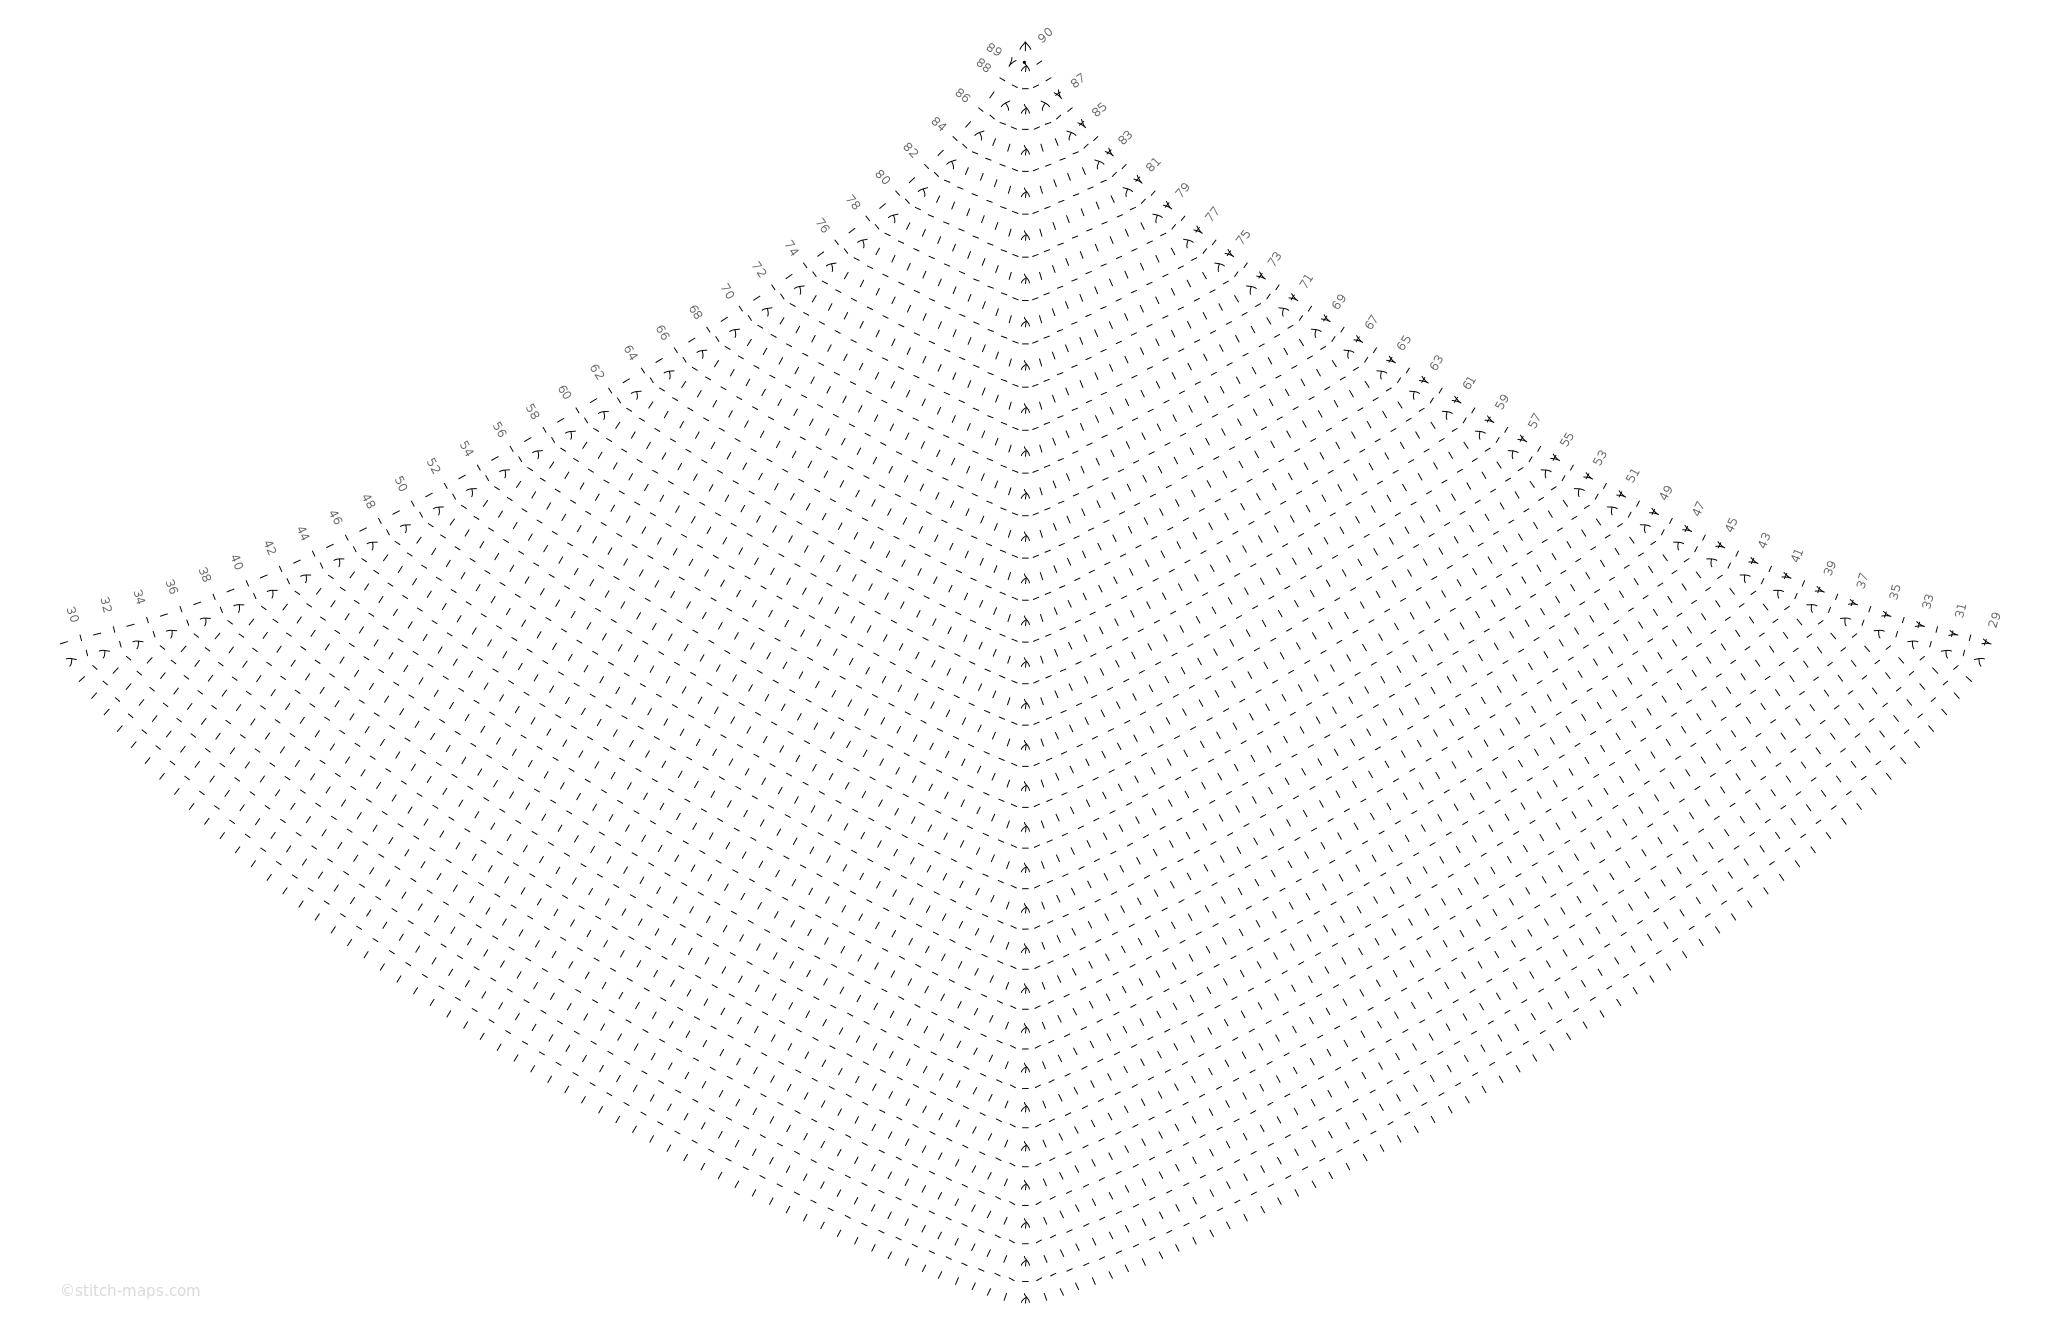 mod 6_2 chart